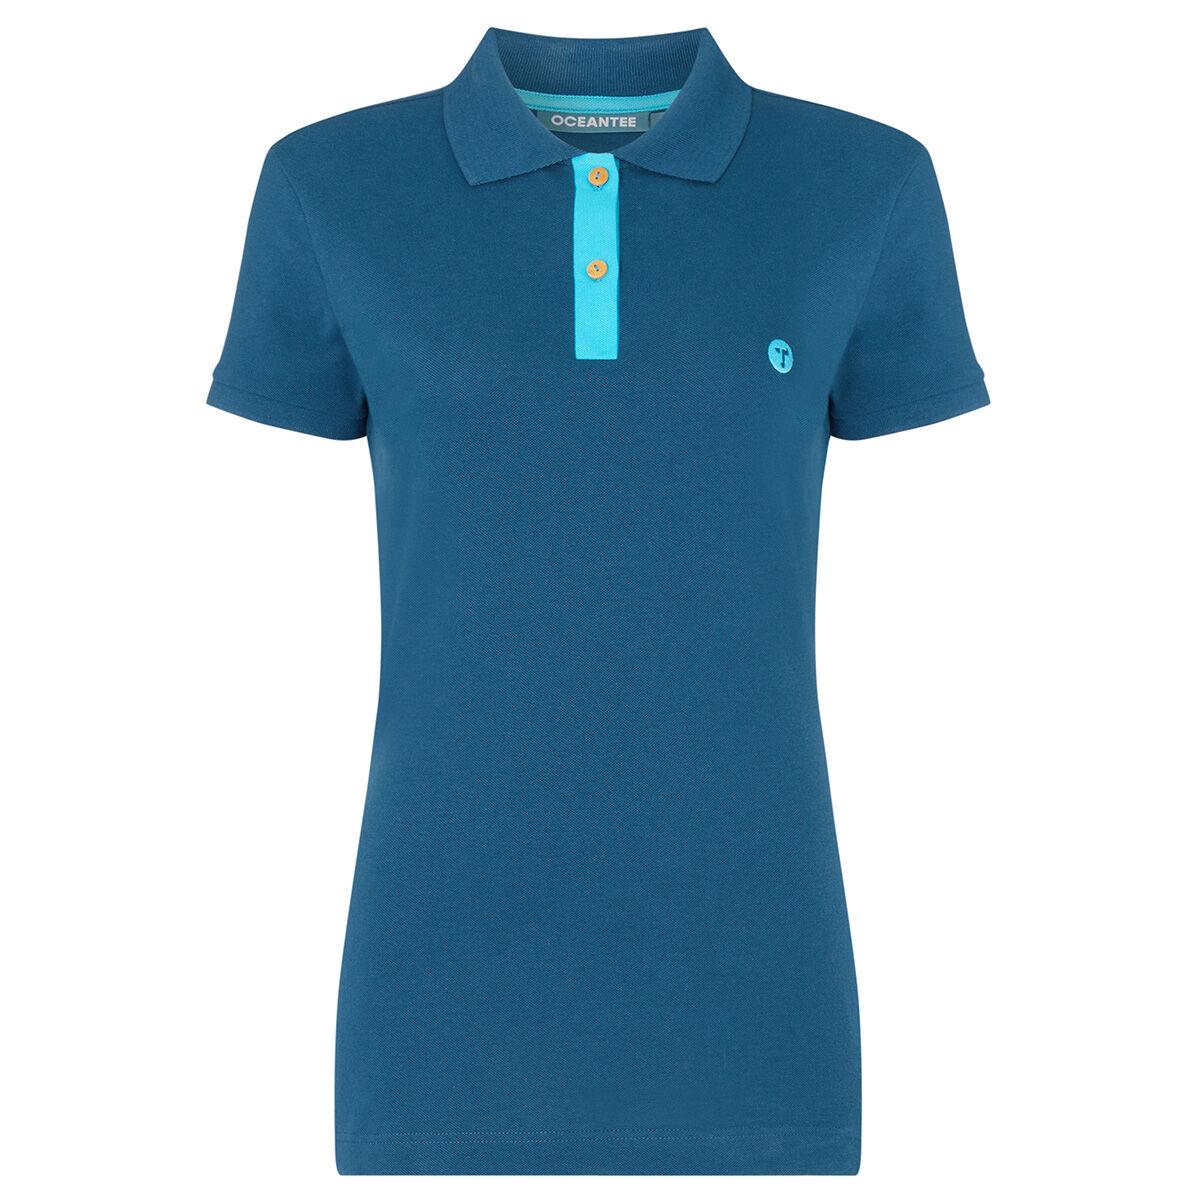 Ocean Tee Mako Womens Golf Polo Shirt, Female, Navy, Large | American Golf